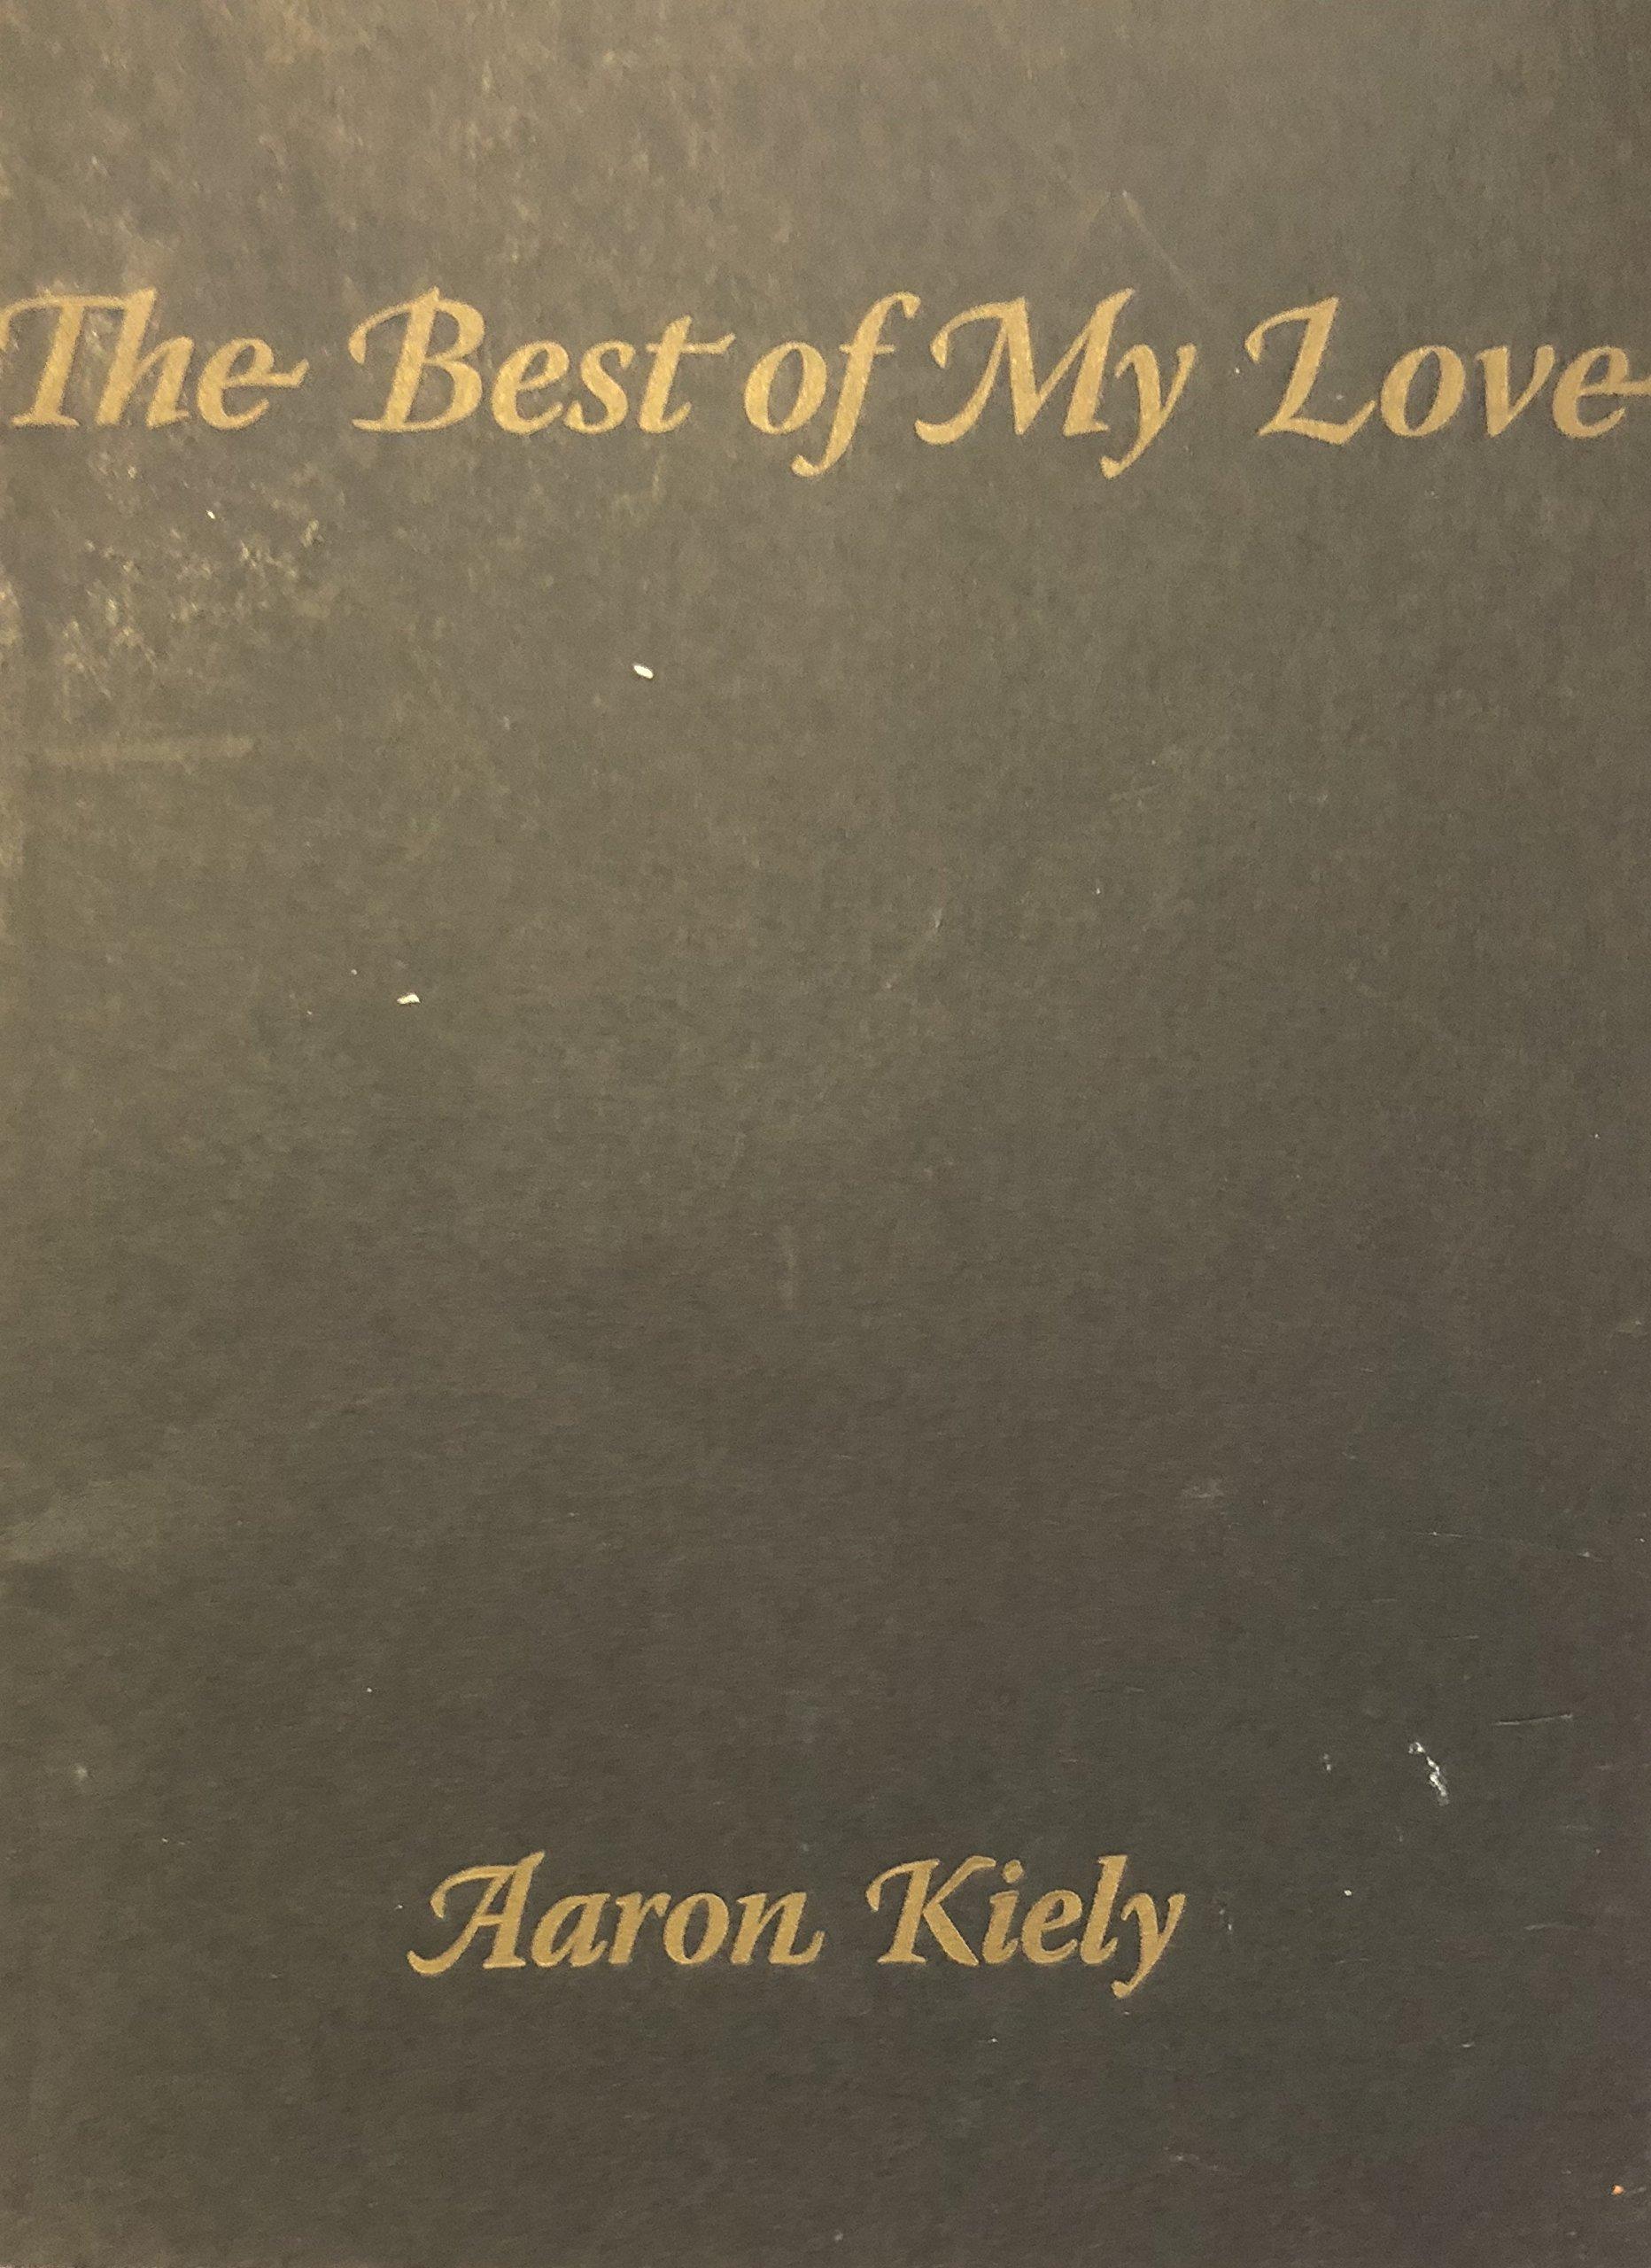 The Best of My Love: Aaron Kiely: 9781933254128: Amazon com: Books